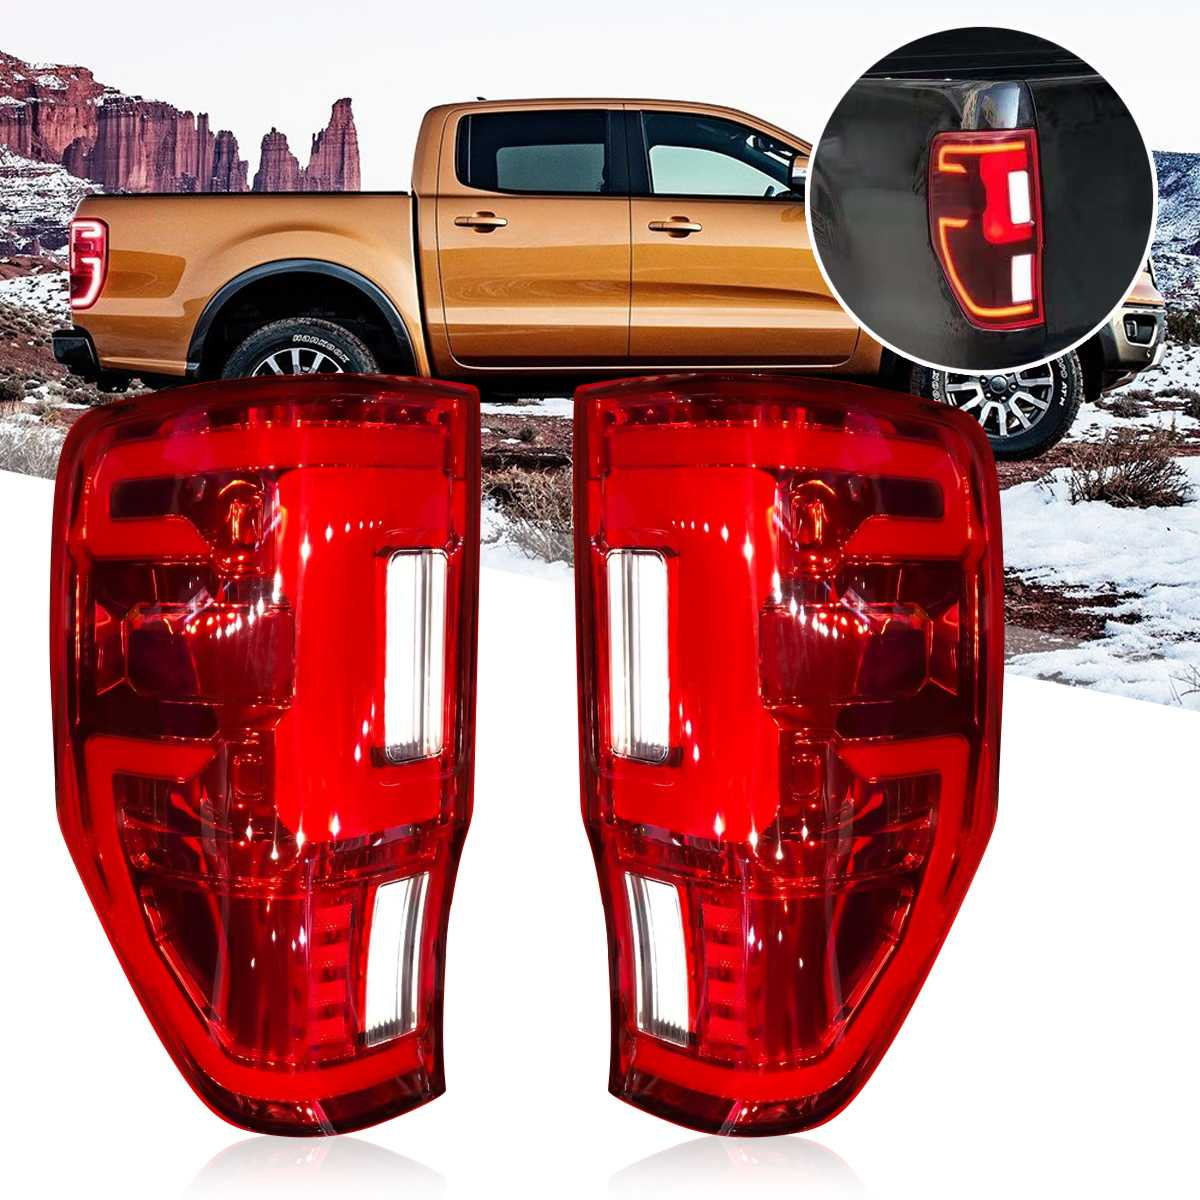 LED Stop Brake Tail Lamp Fit Nissan Navara Np300 D23 Pick Up 2015 17 Xlt Ute